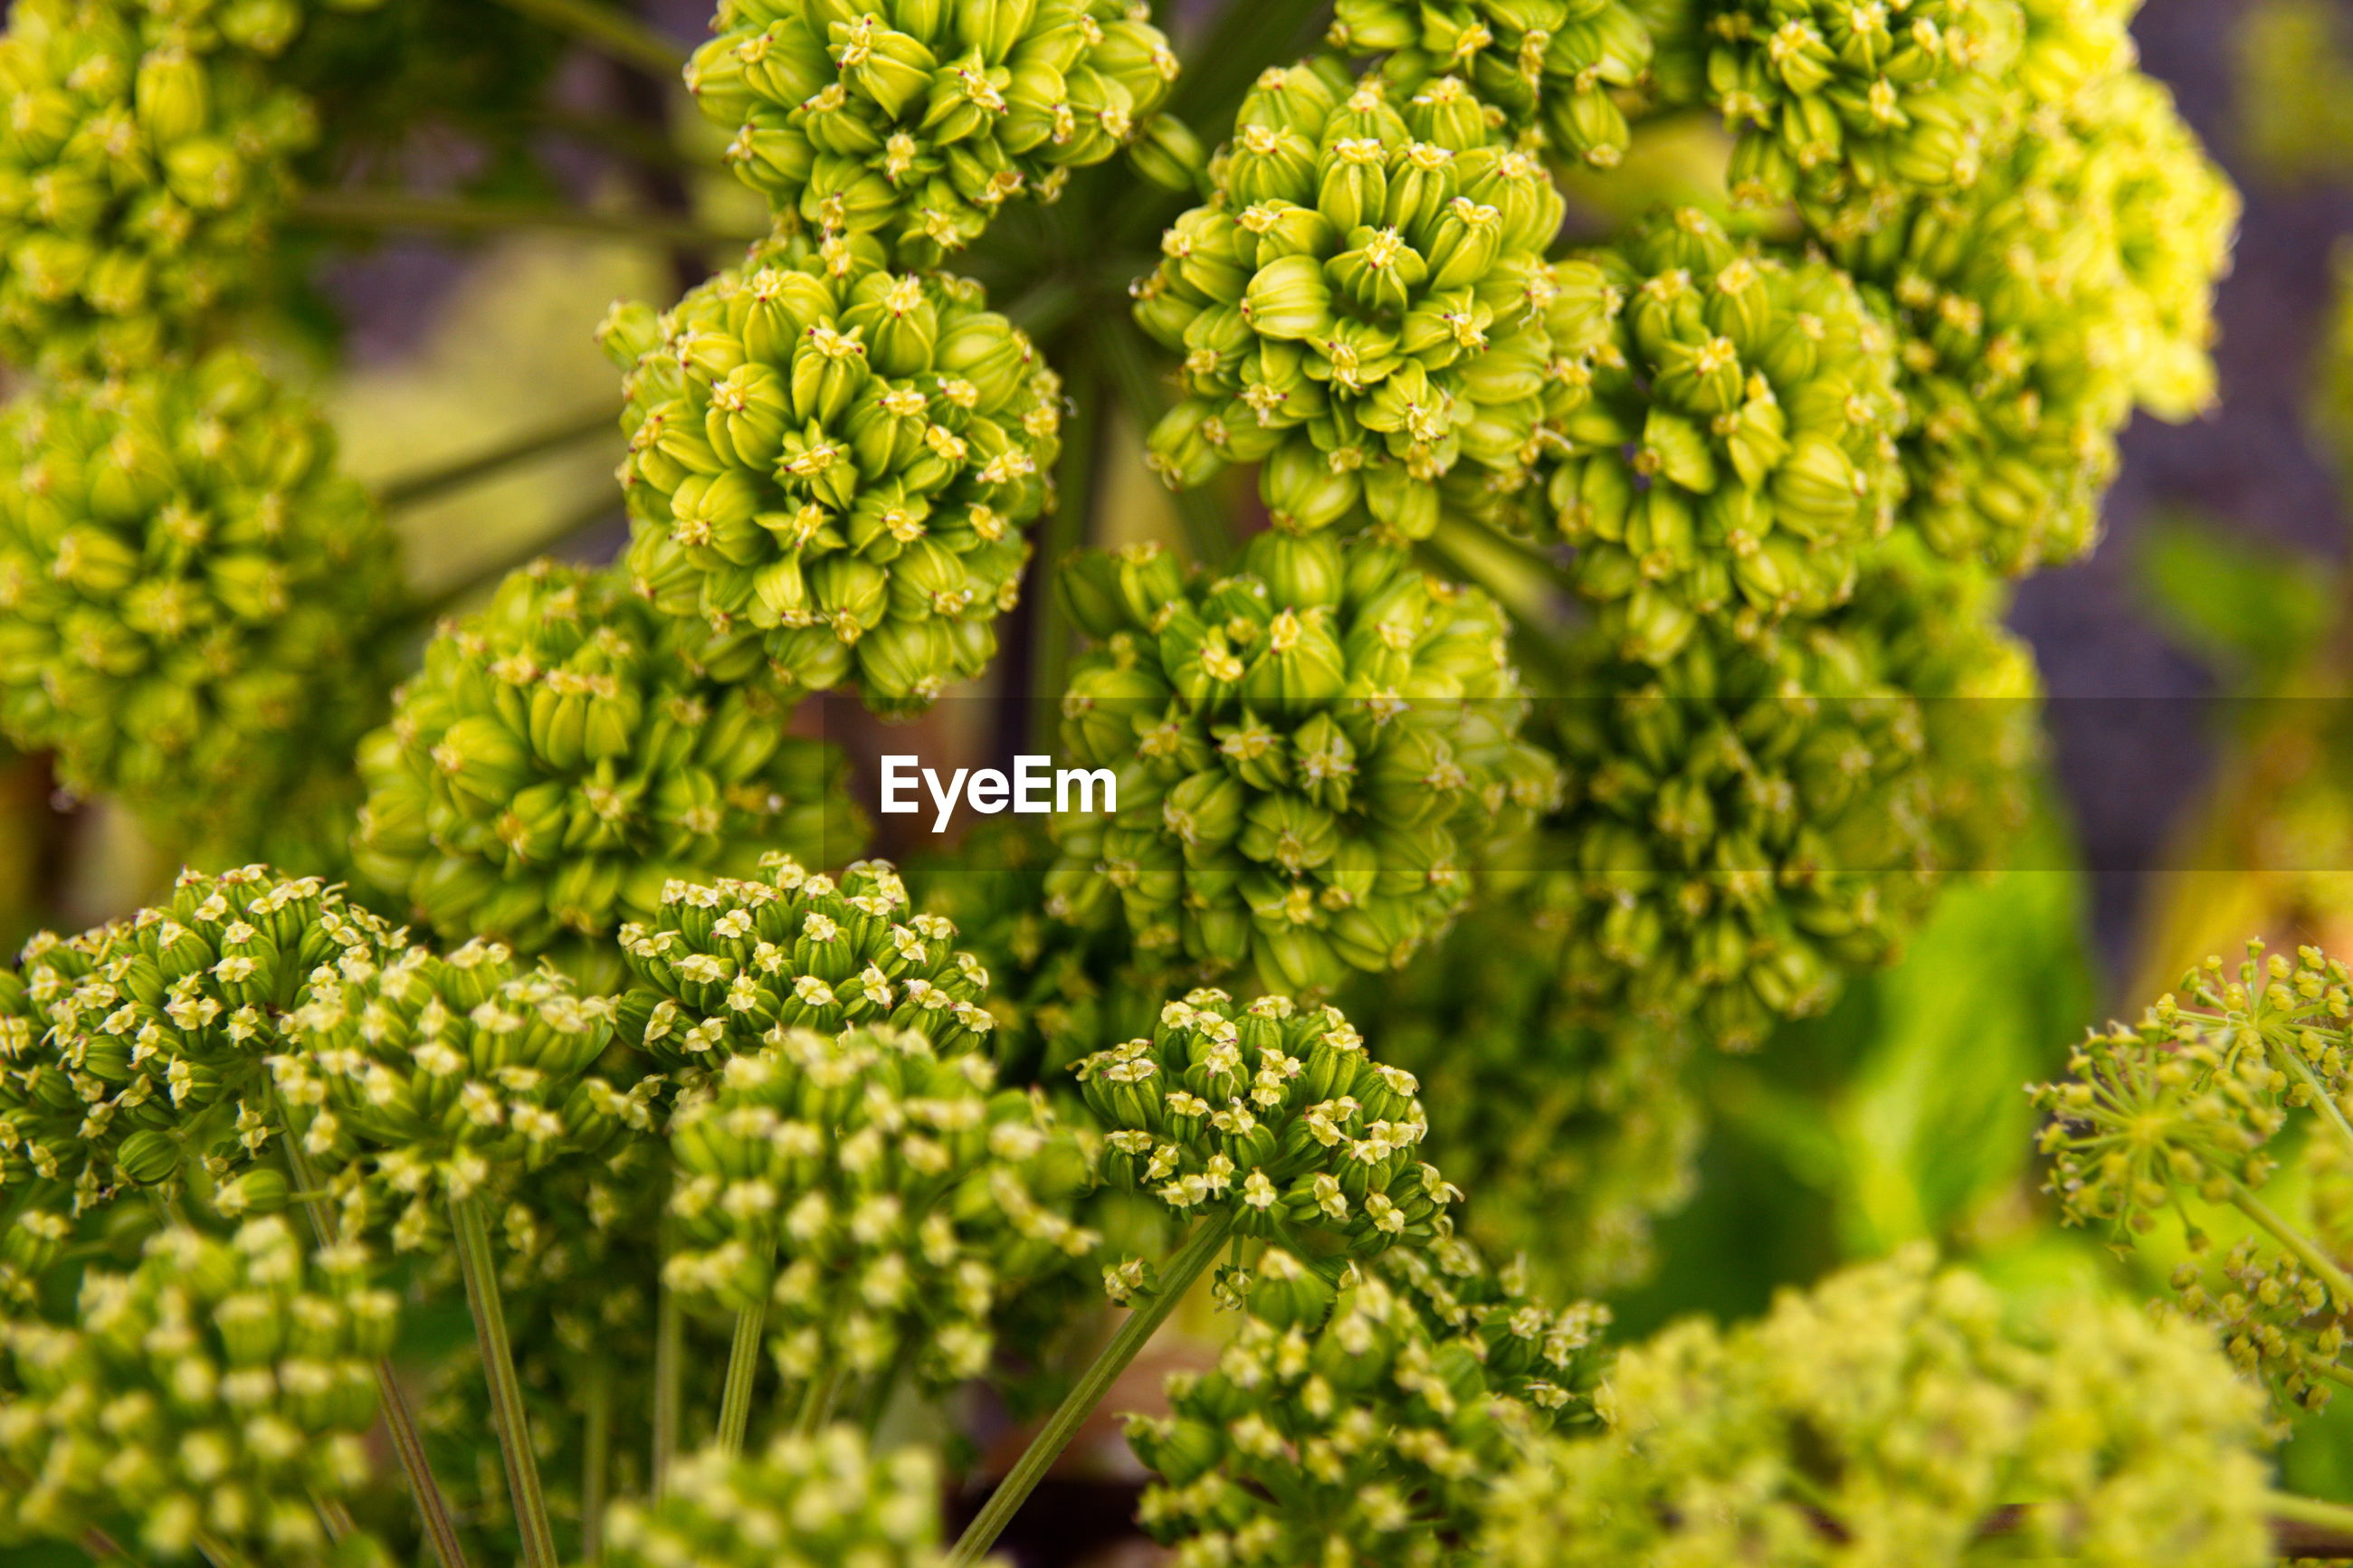 Close-up of fresh green herbs